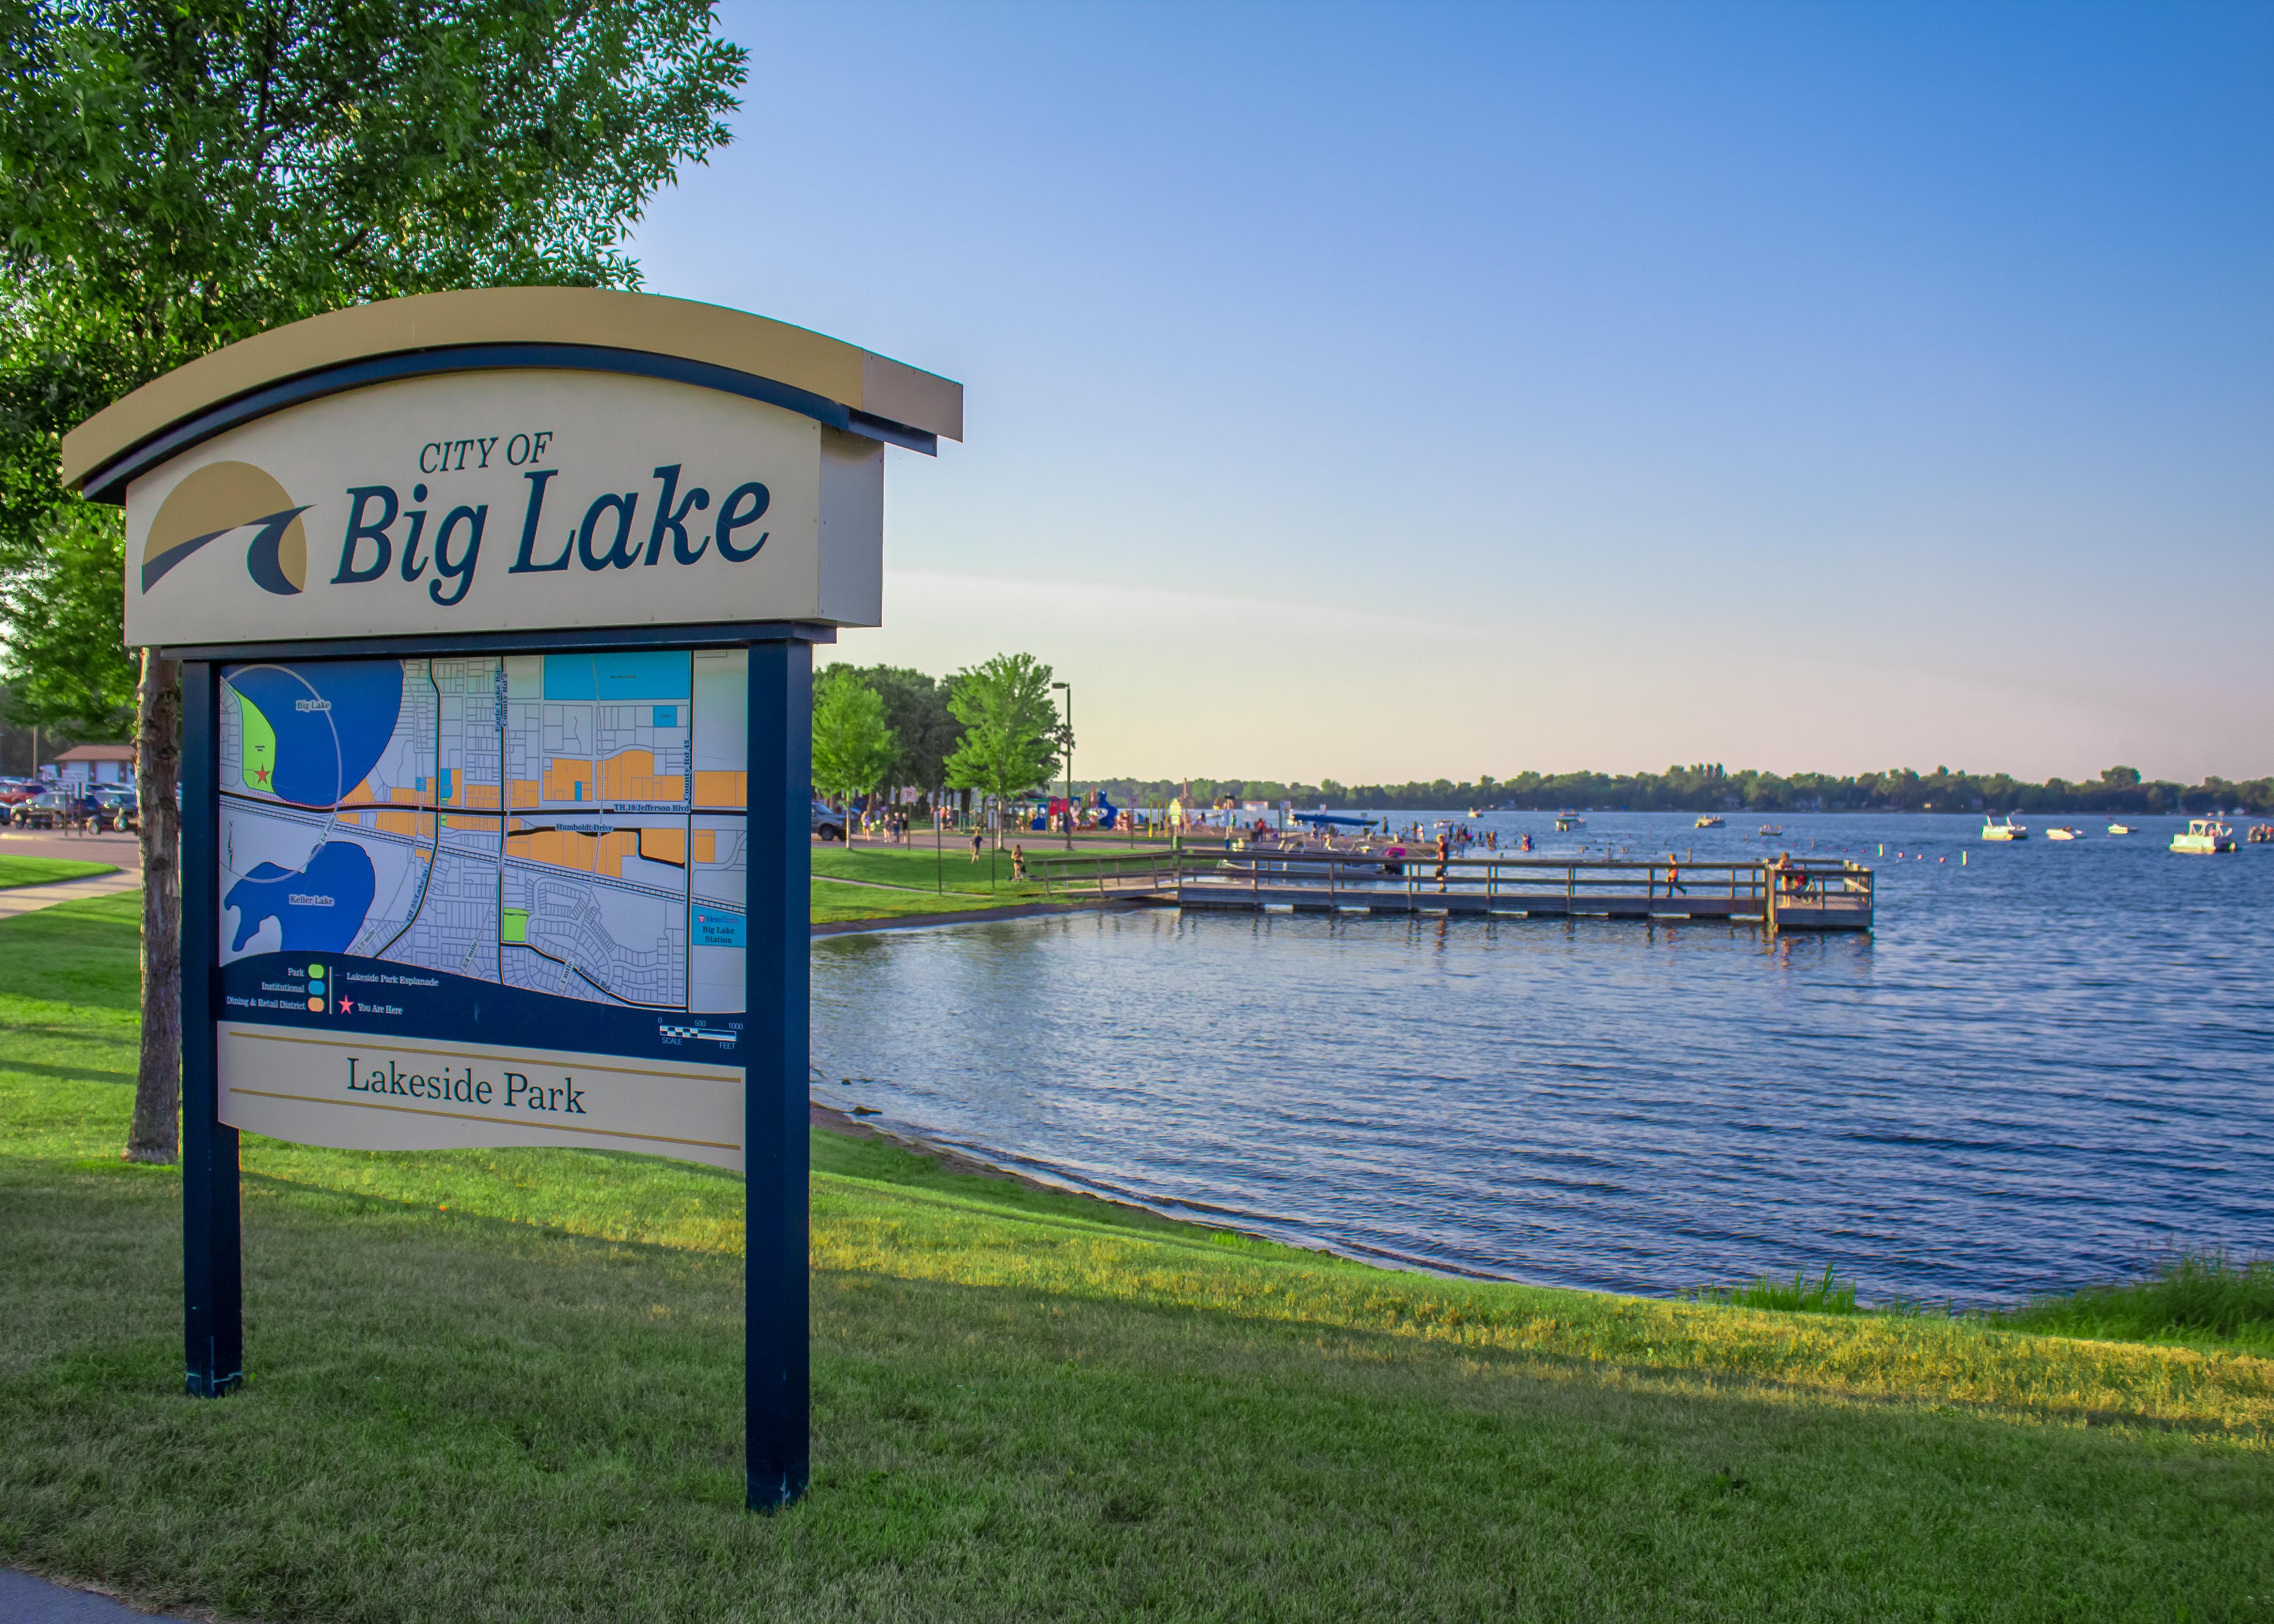 Lake in Big Lake, Minnesota